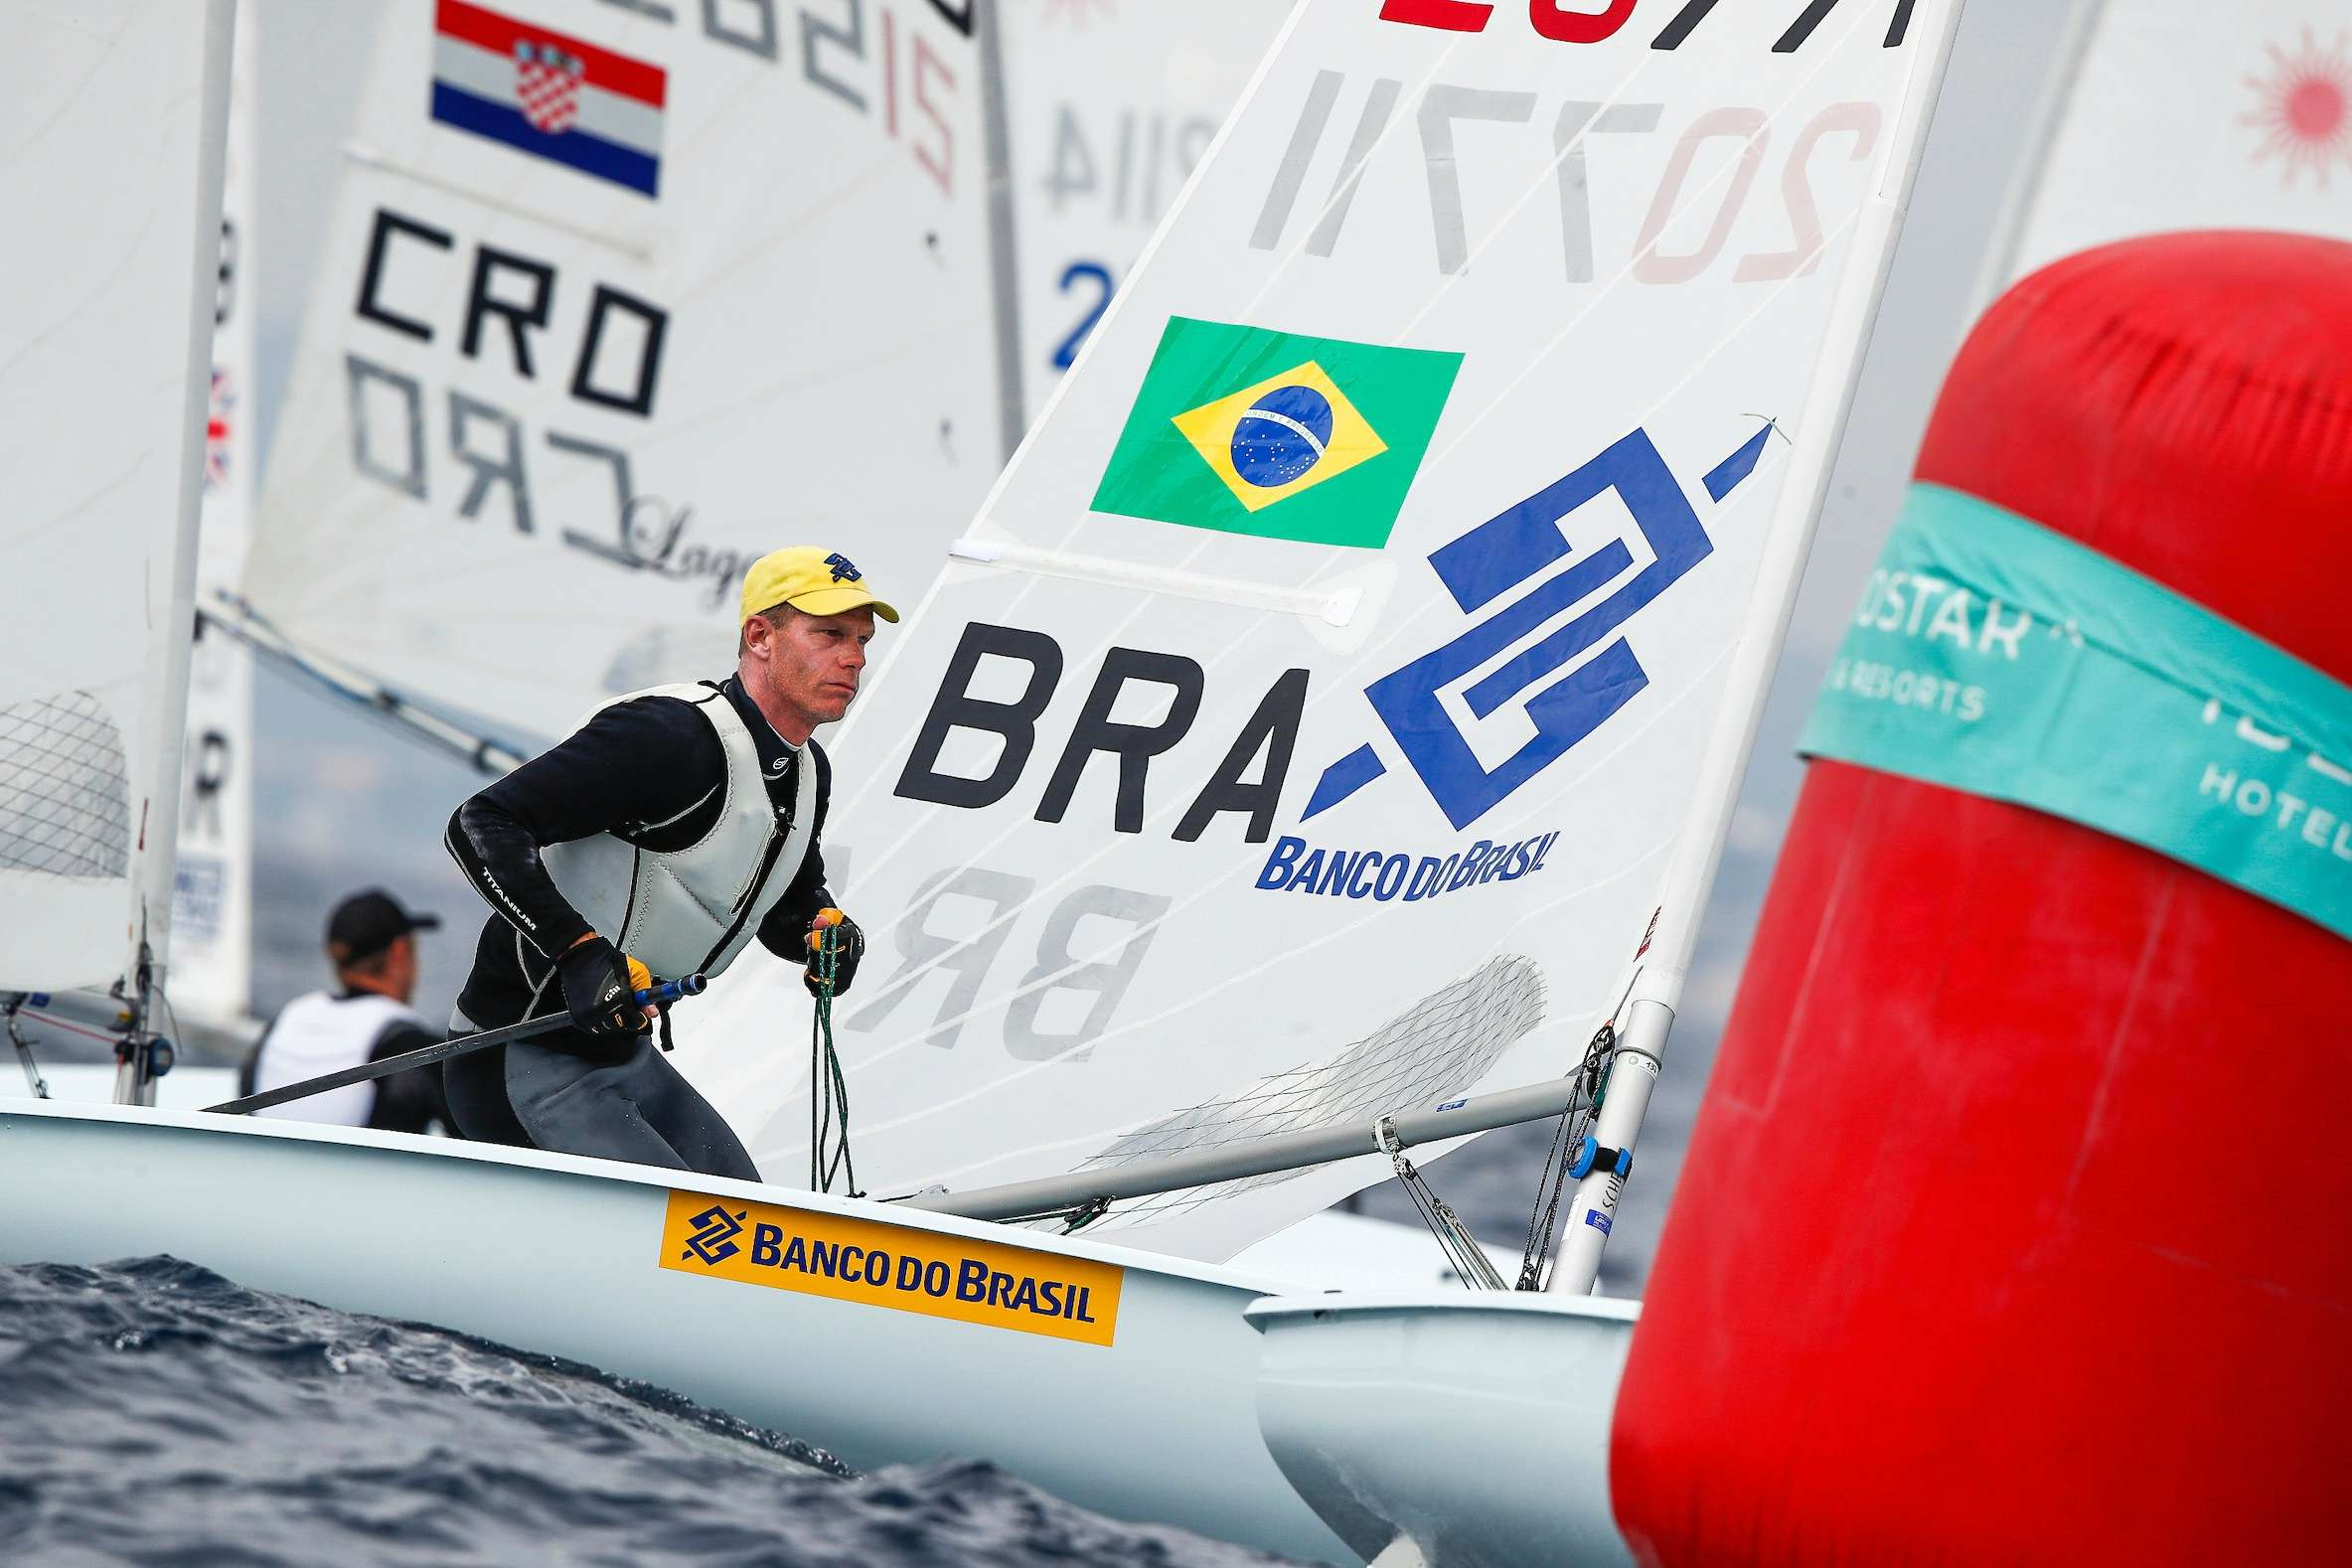 Robert Scheidt faz índice e deve ir para sétima Olimpíada